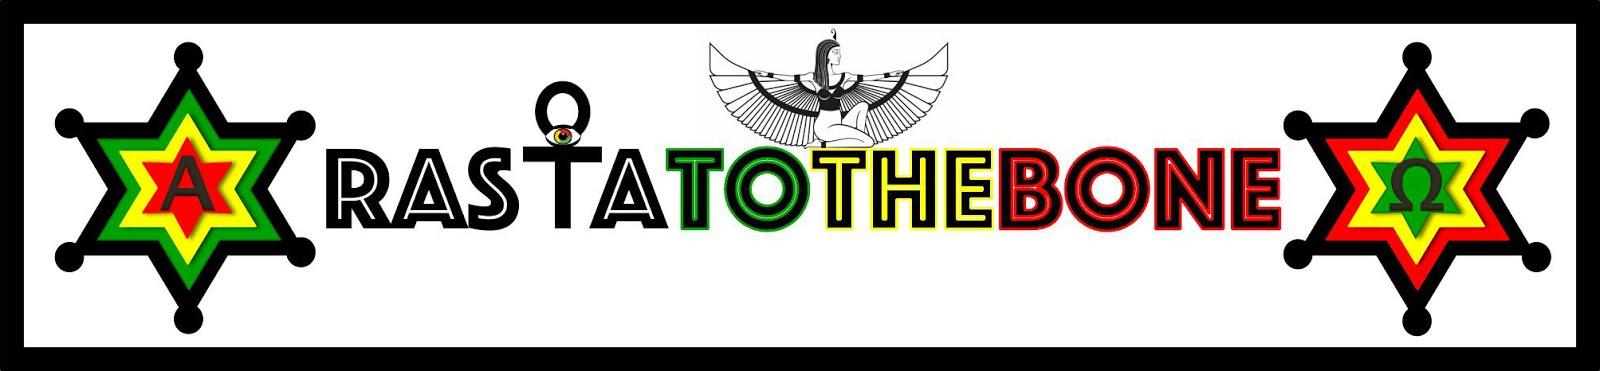 RASTATOTHEBONE